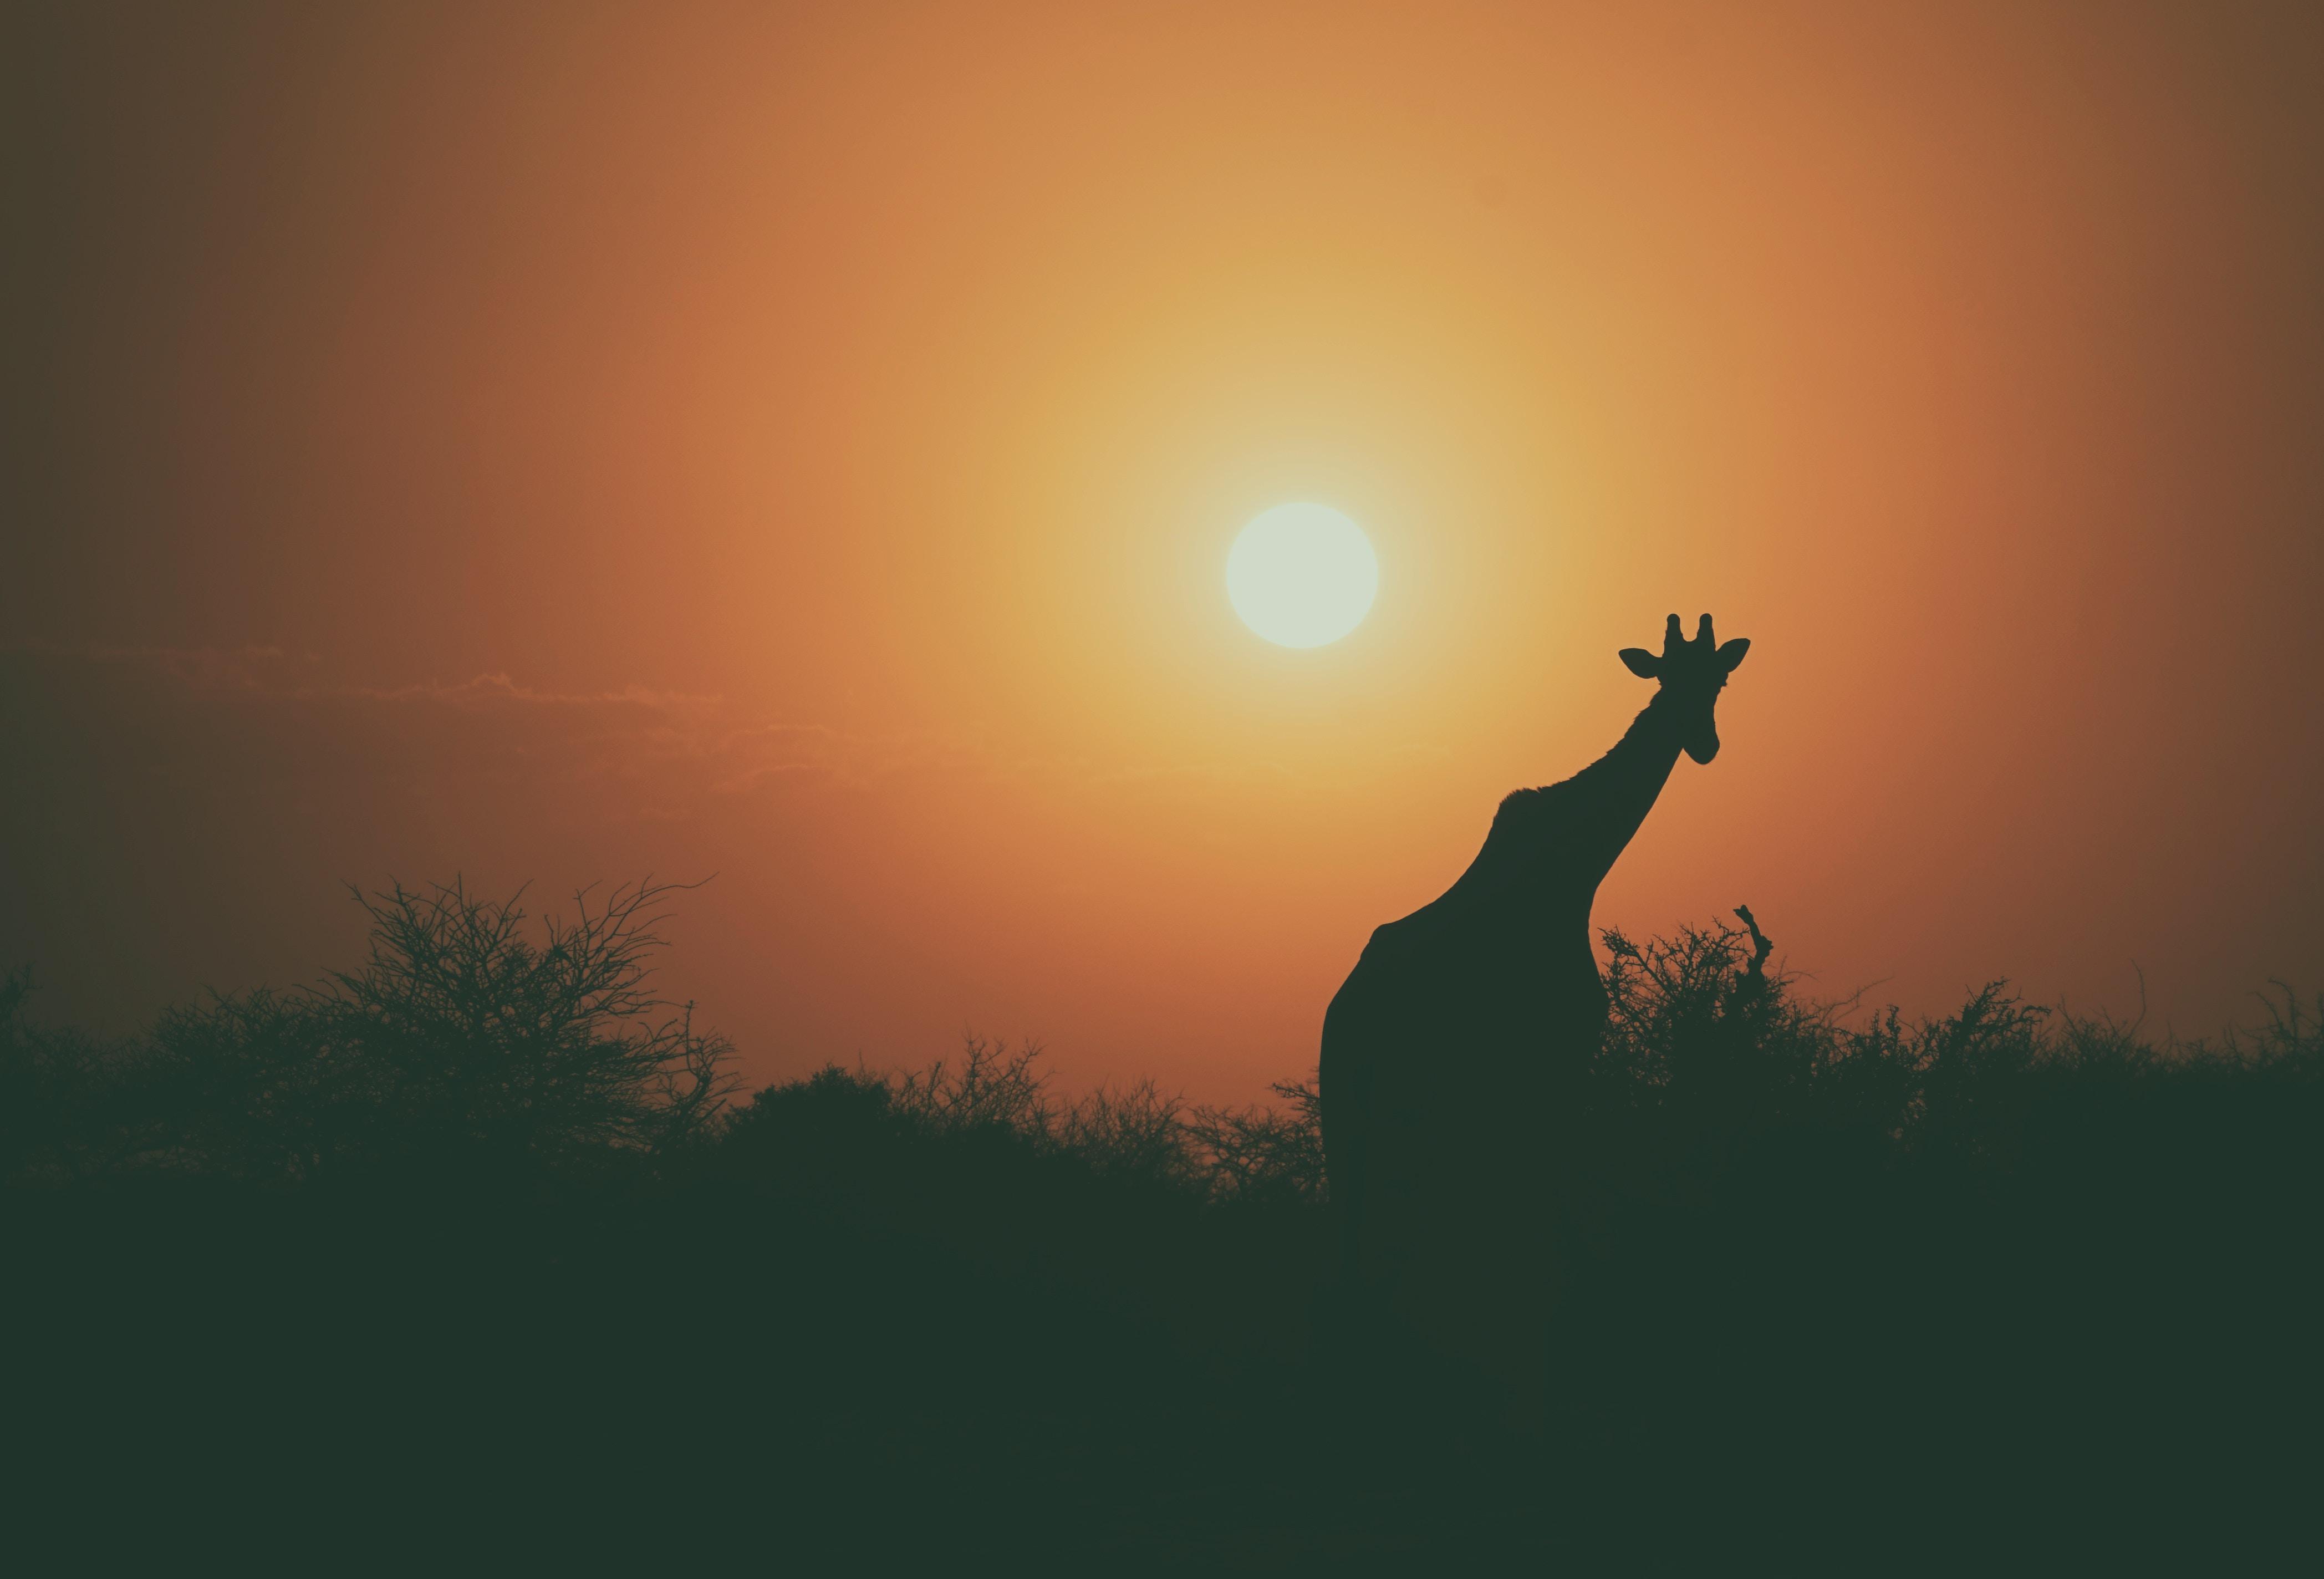 camel silhouette 1574937978 - Camel Silhouette -